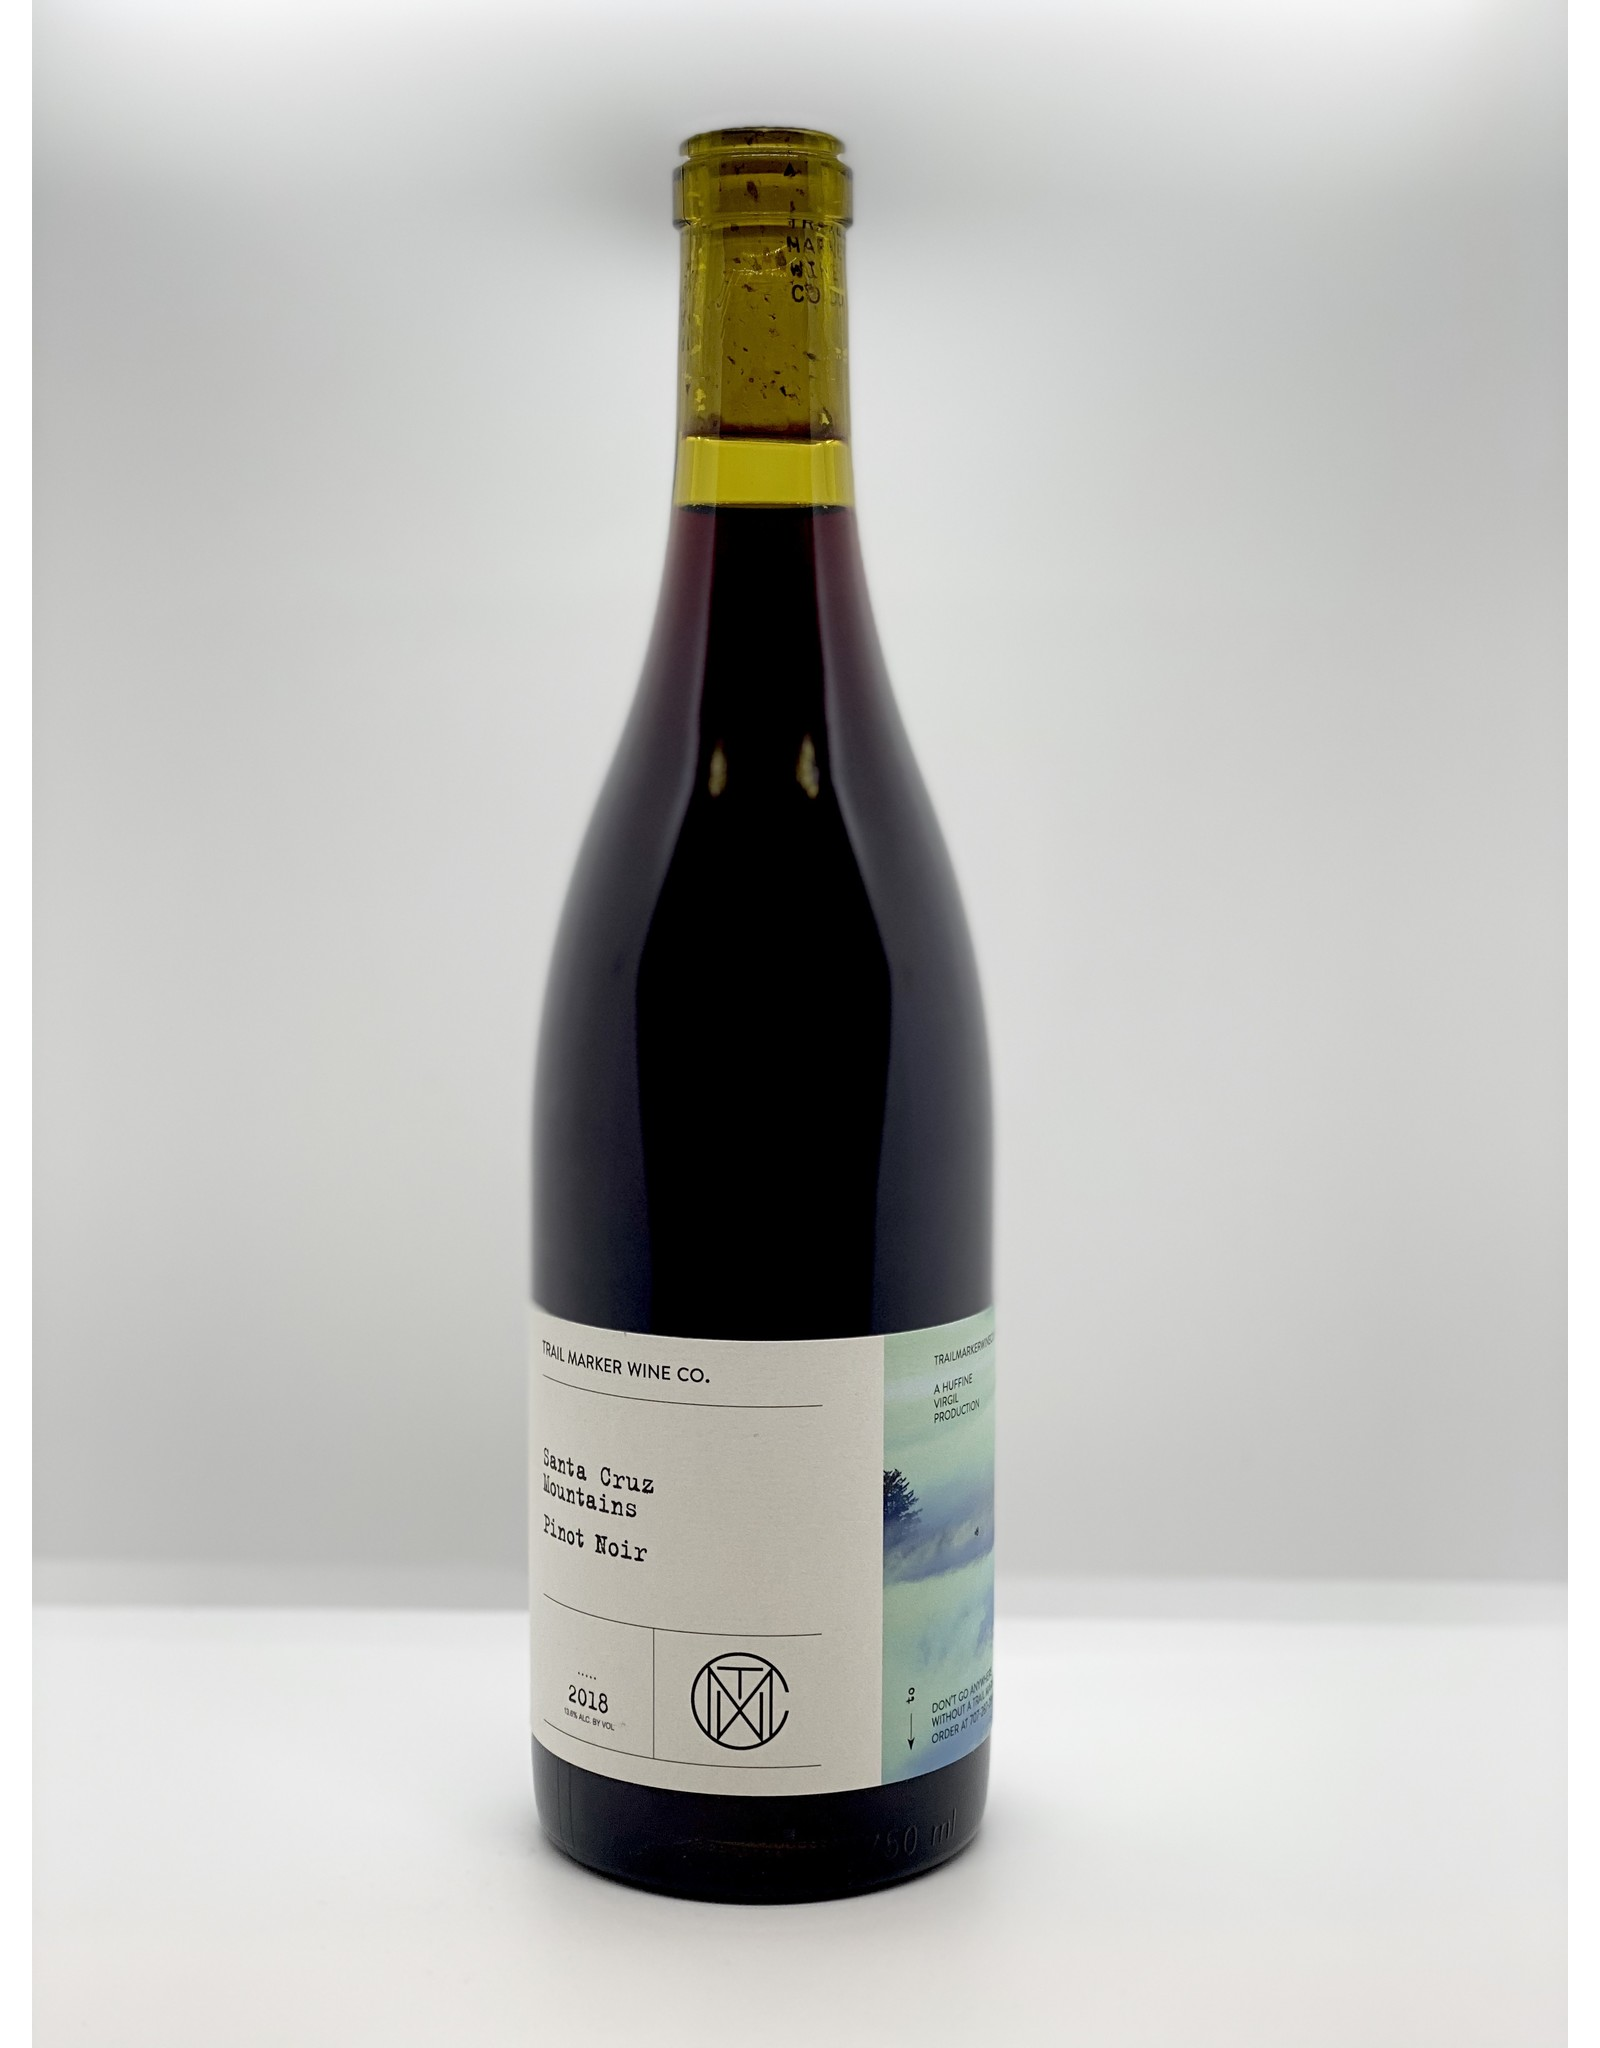 Trail Marker Wine Co Pinot Noir Santa Cruz Mointains